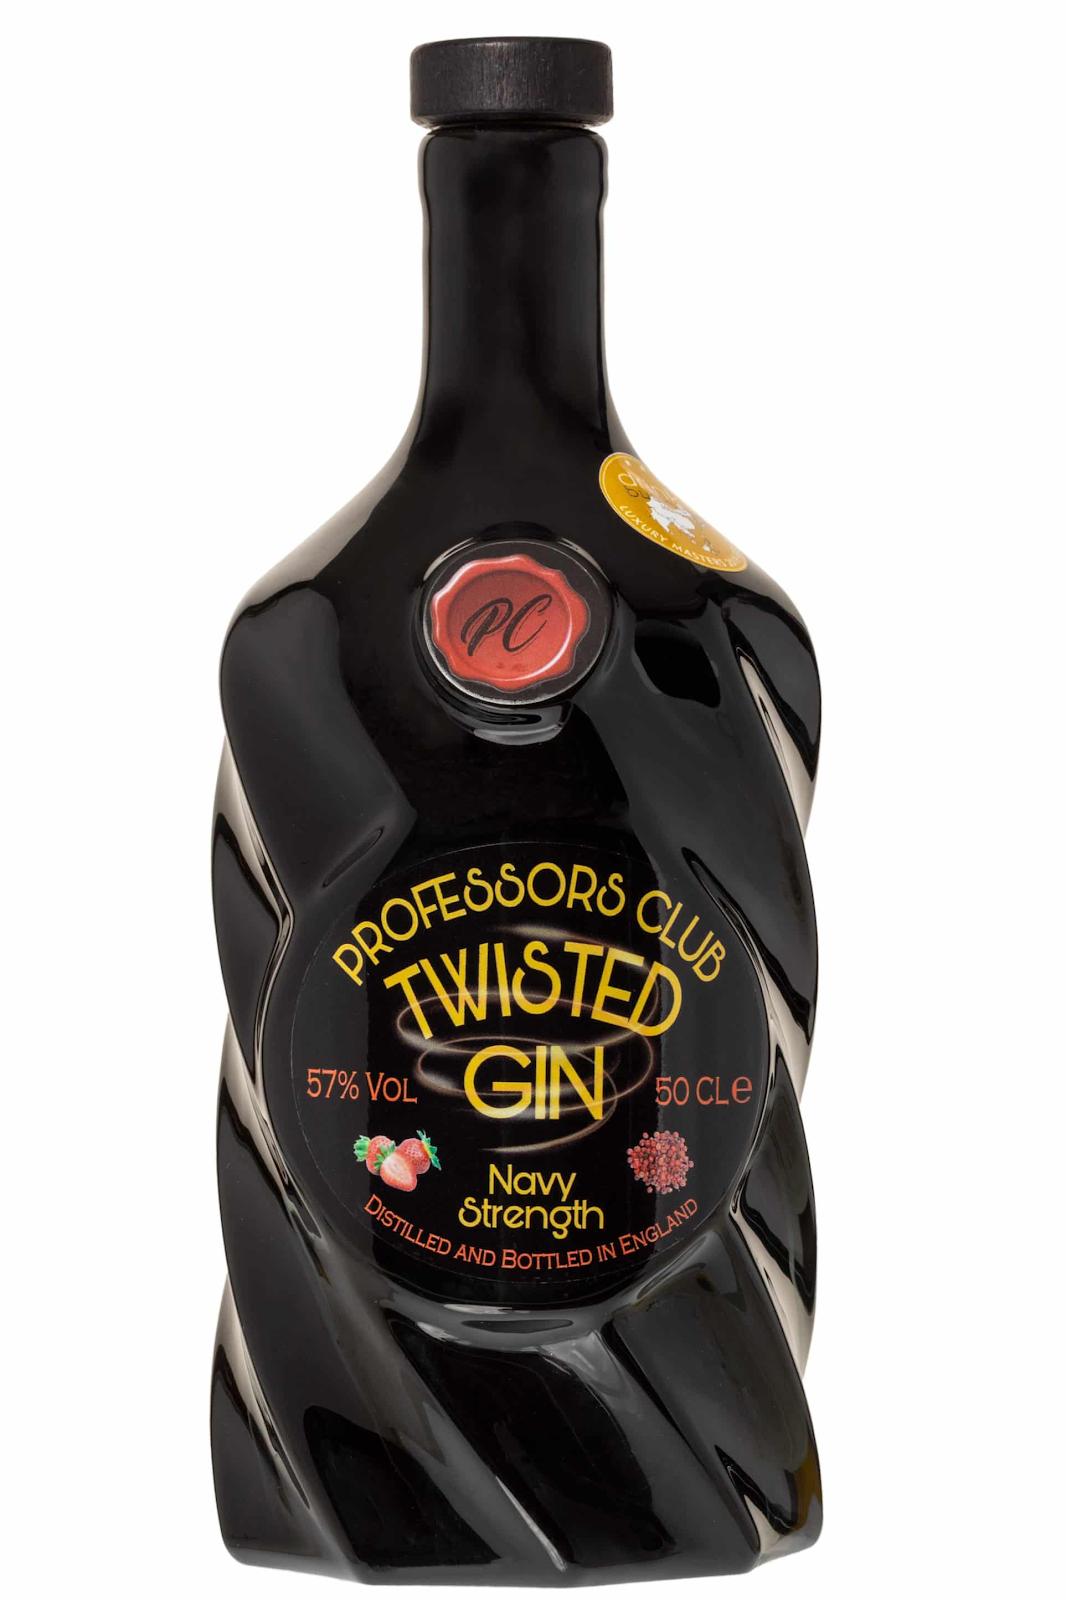 Professors Club Twisted Gin